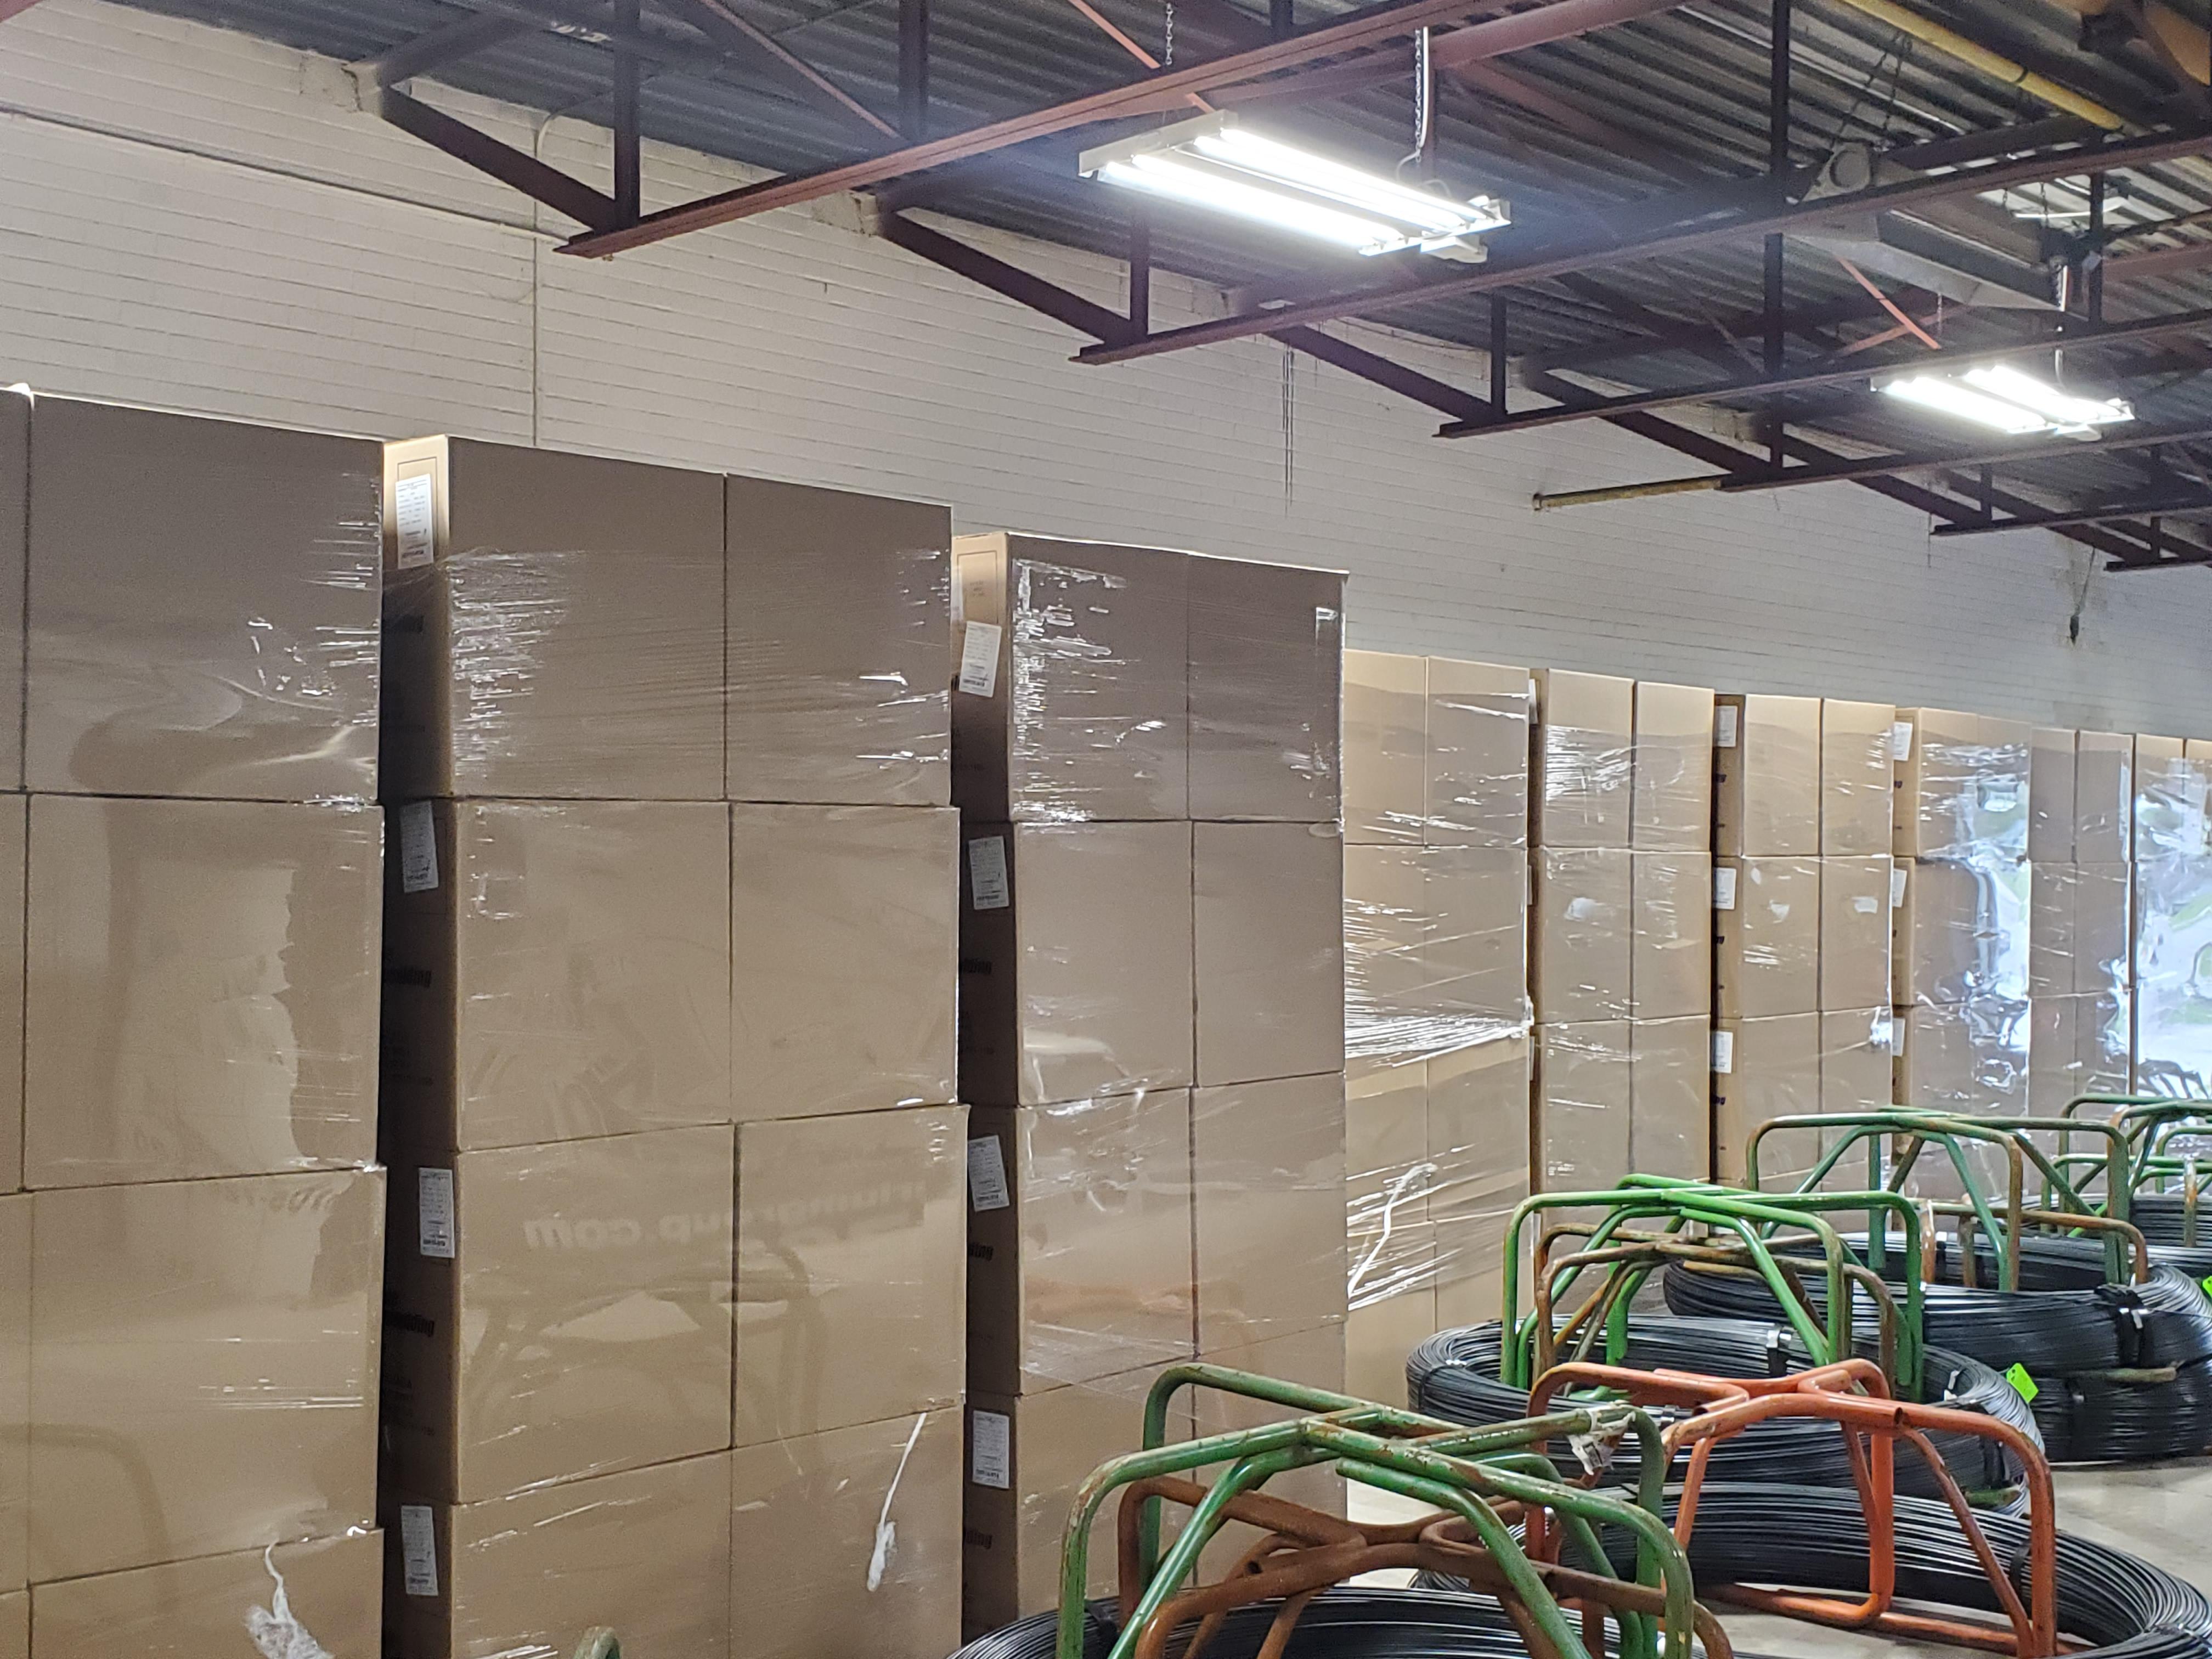 25,000 HDPE Bottles, NATURAL, NEW, 24/410 Neck, 16oz Boston Round - Image 4 of 6